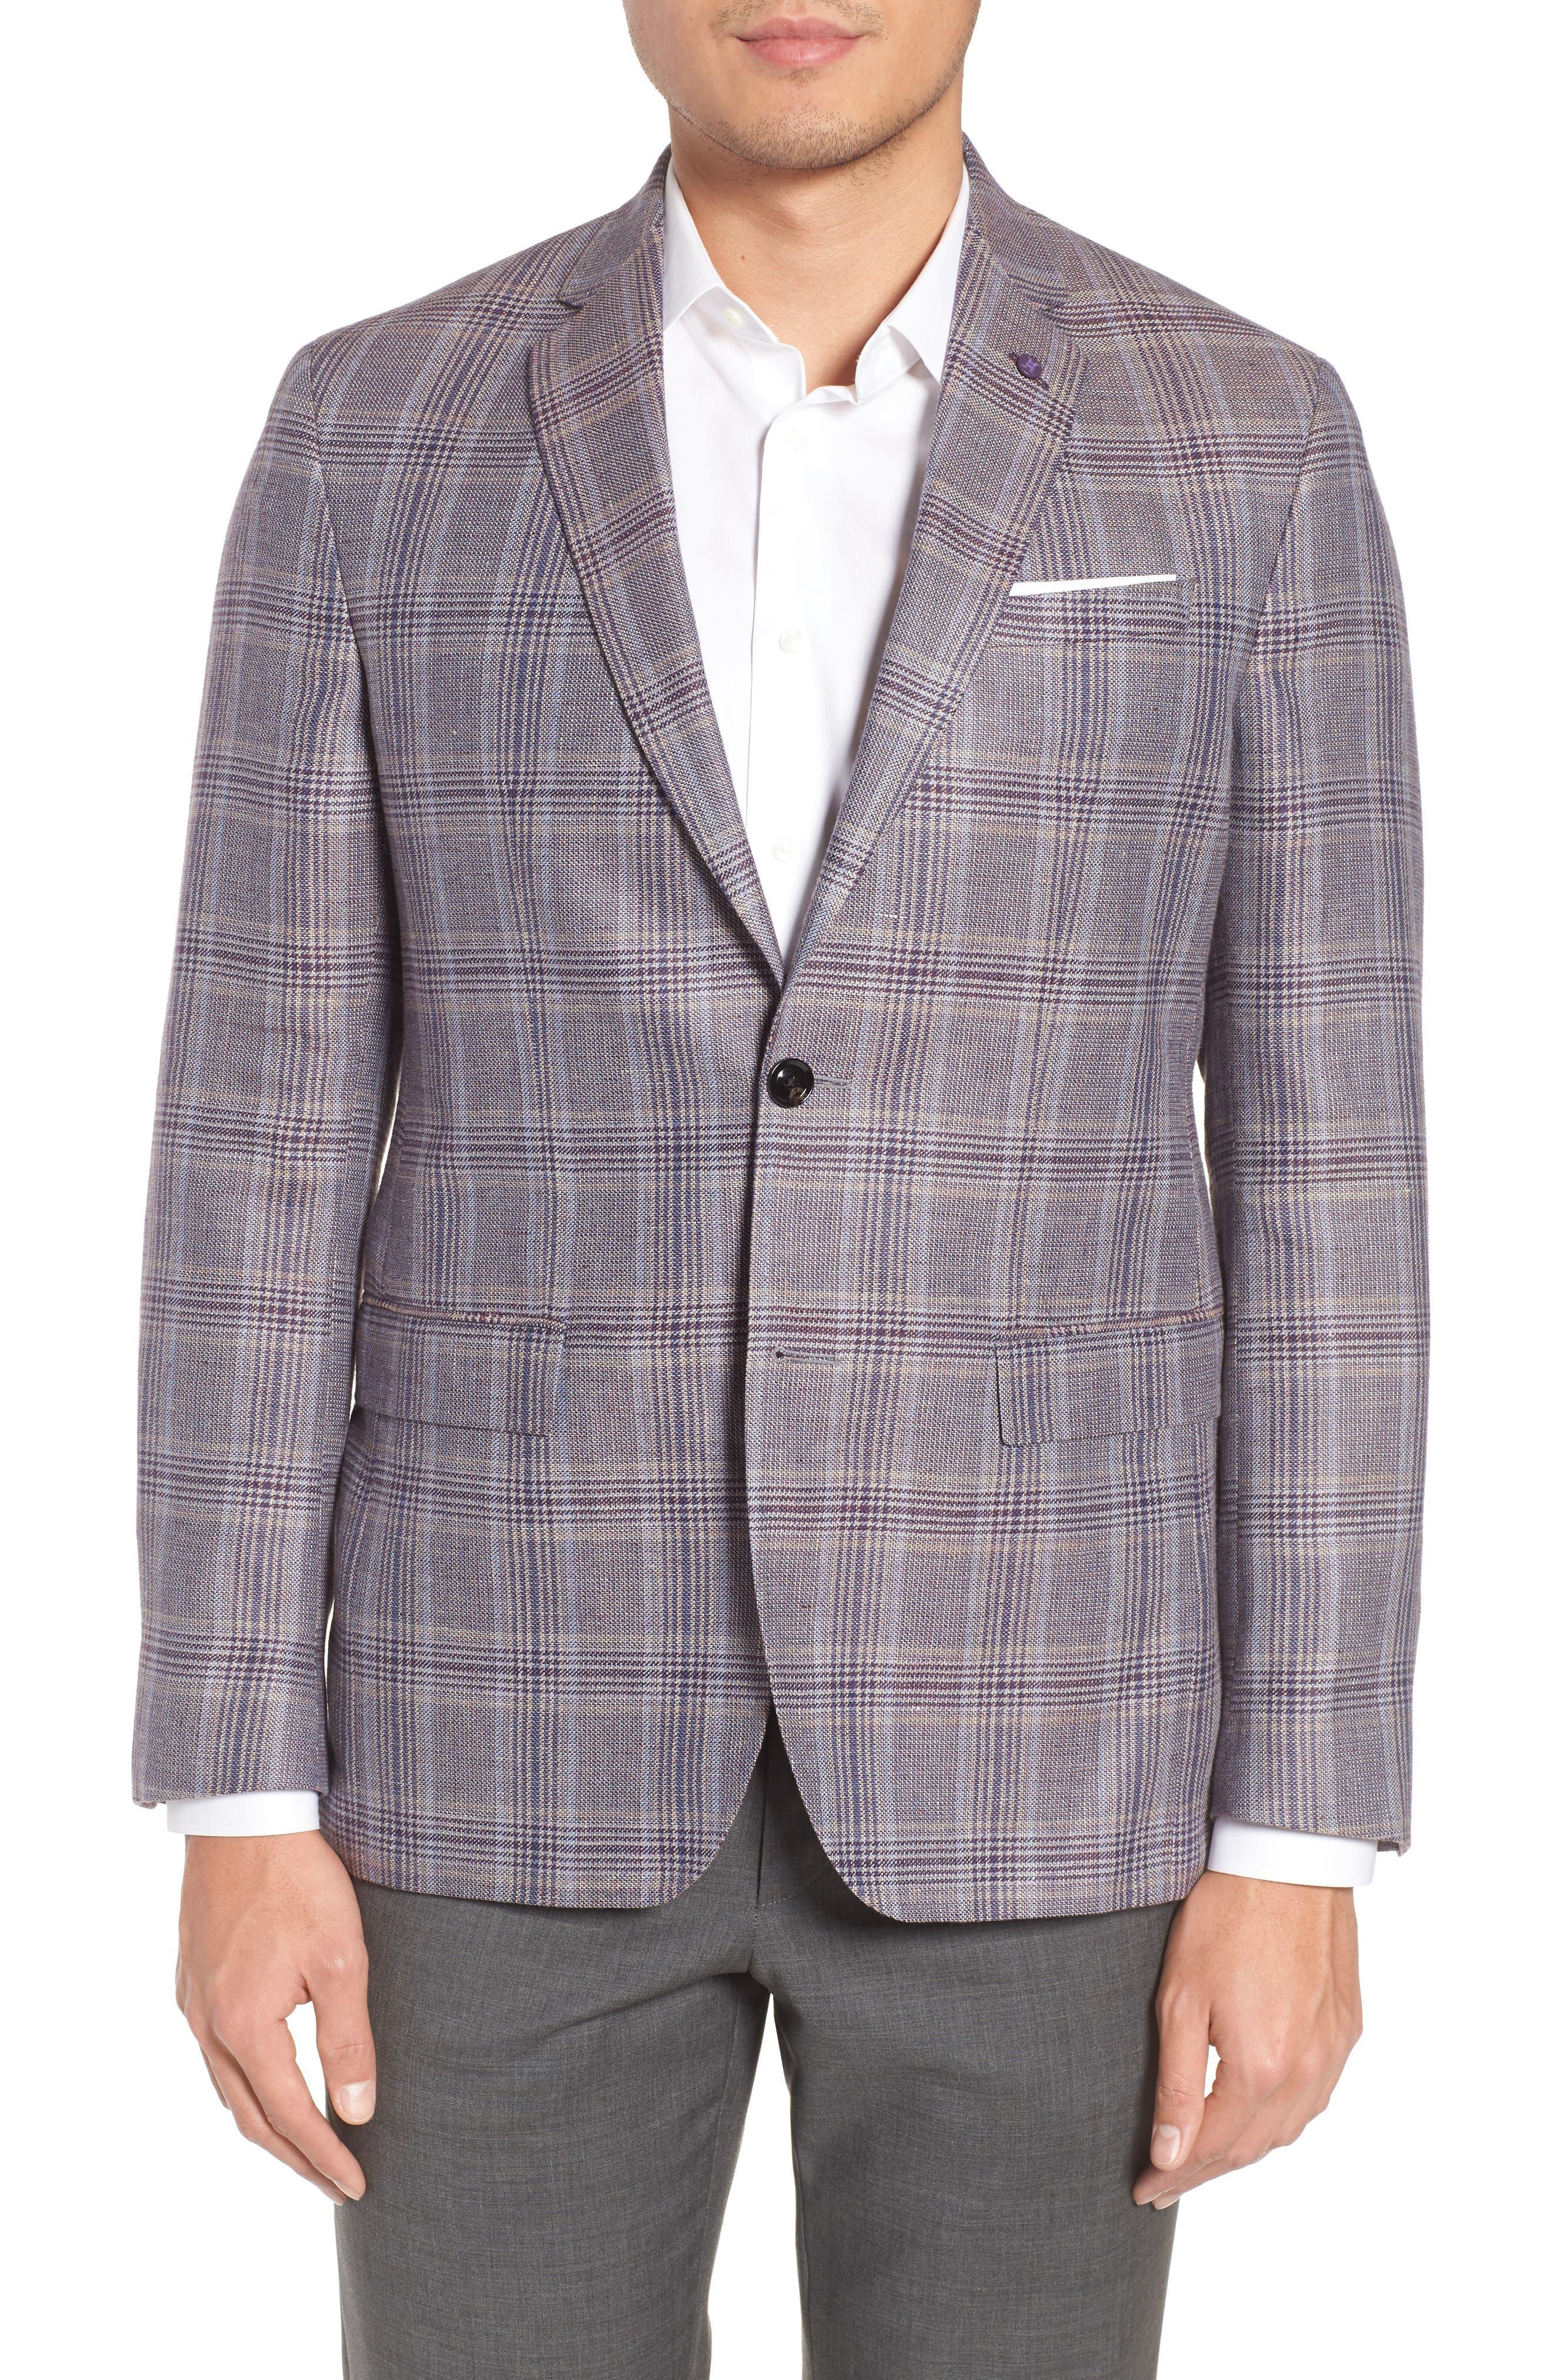 Konan Trim Fit Plaid Linen & Wool Sport Coat,                             Main thumbnail 1, color,                             Tan